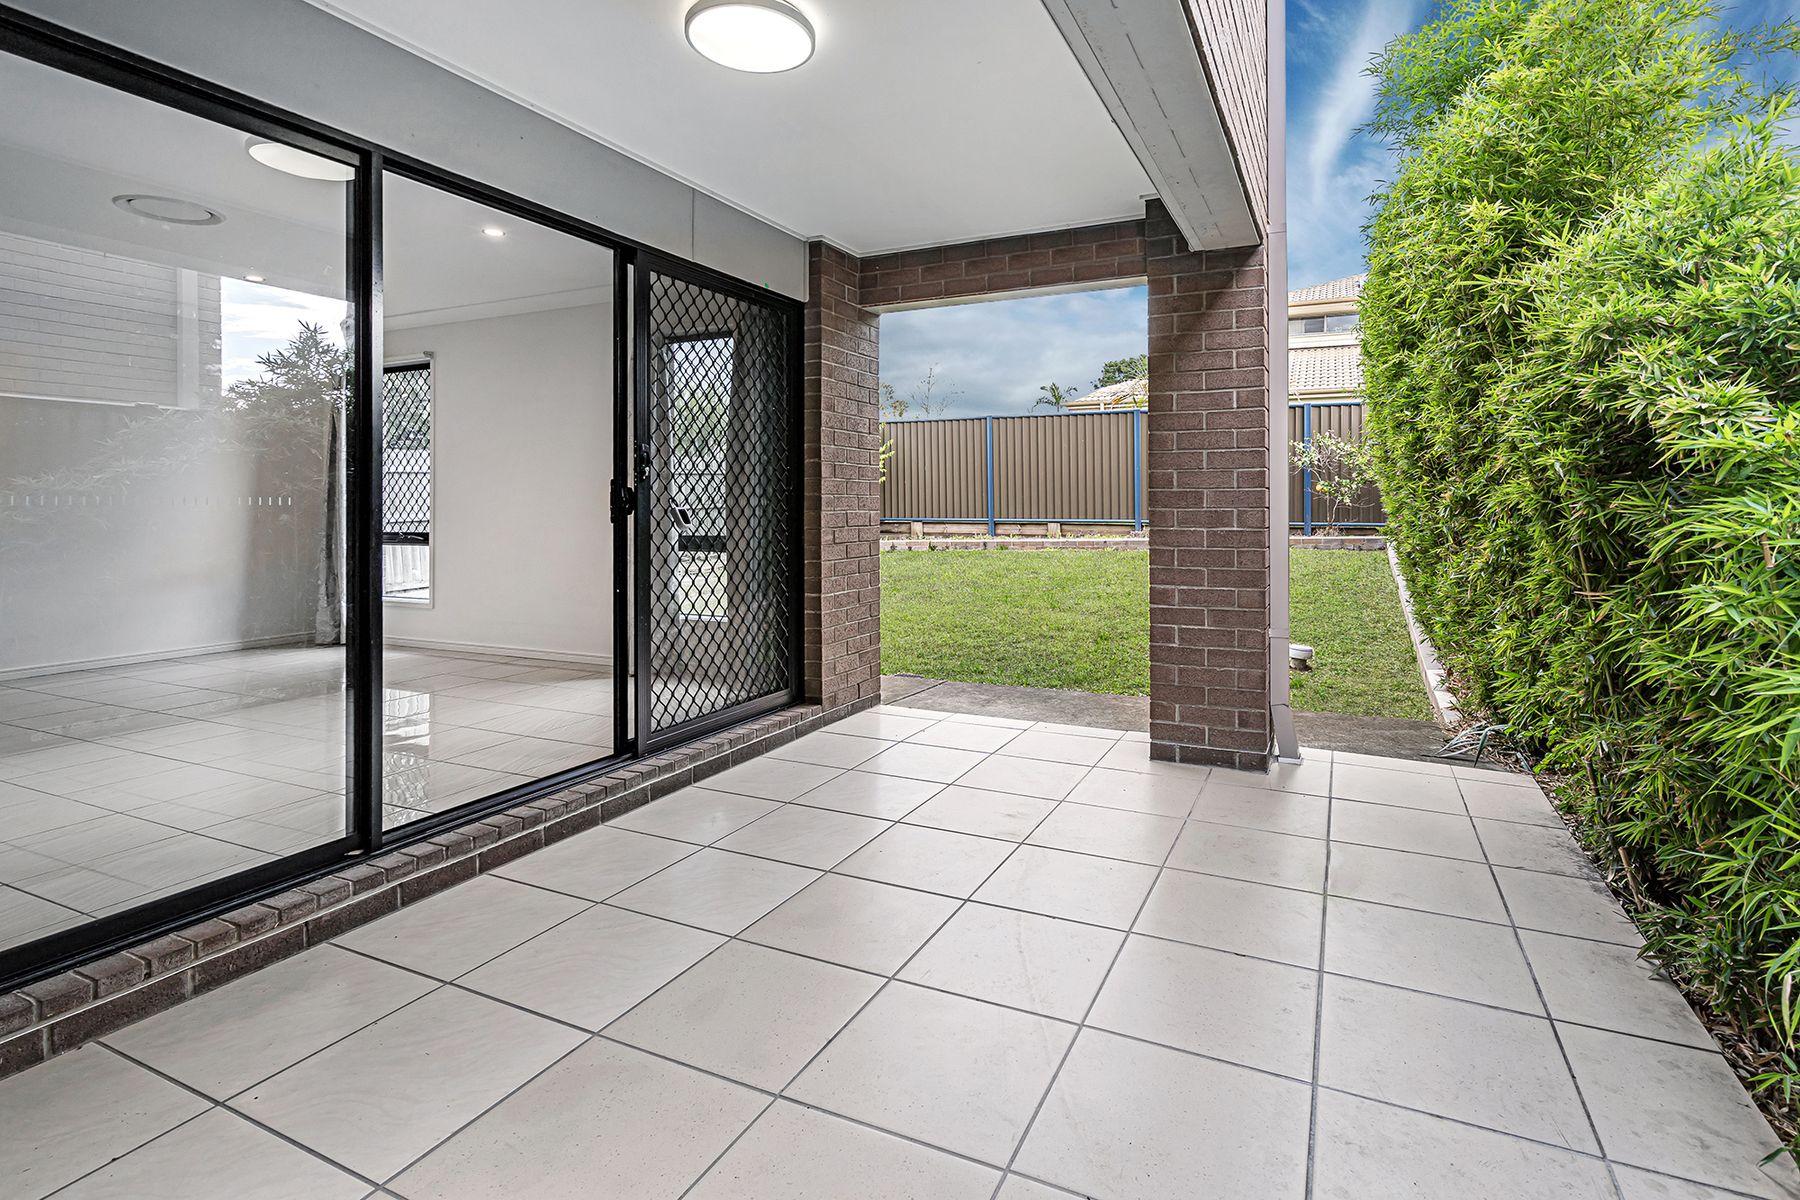 905 Beenleigh Road, Runcorn, QLD 4113